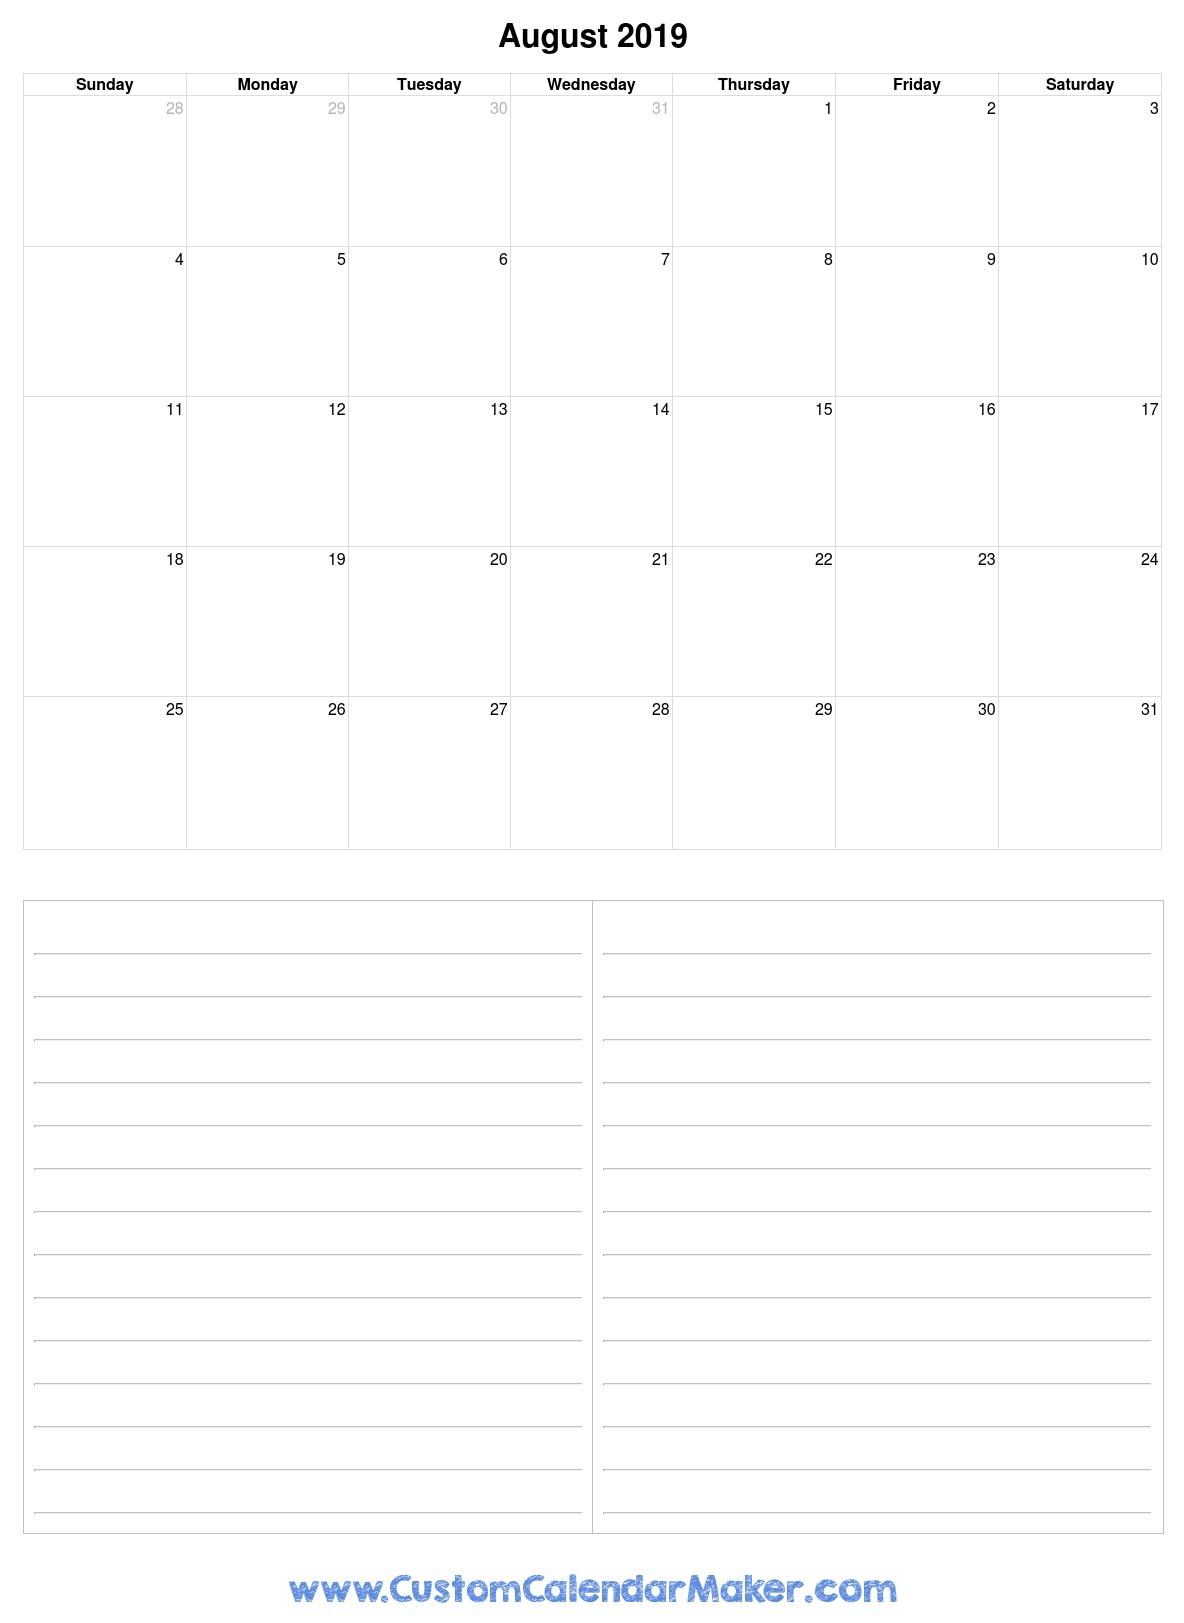 August 2019 Printable Calendars - Blank Pdf Templates